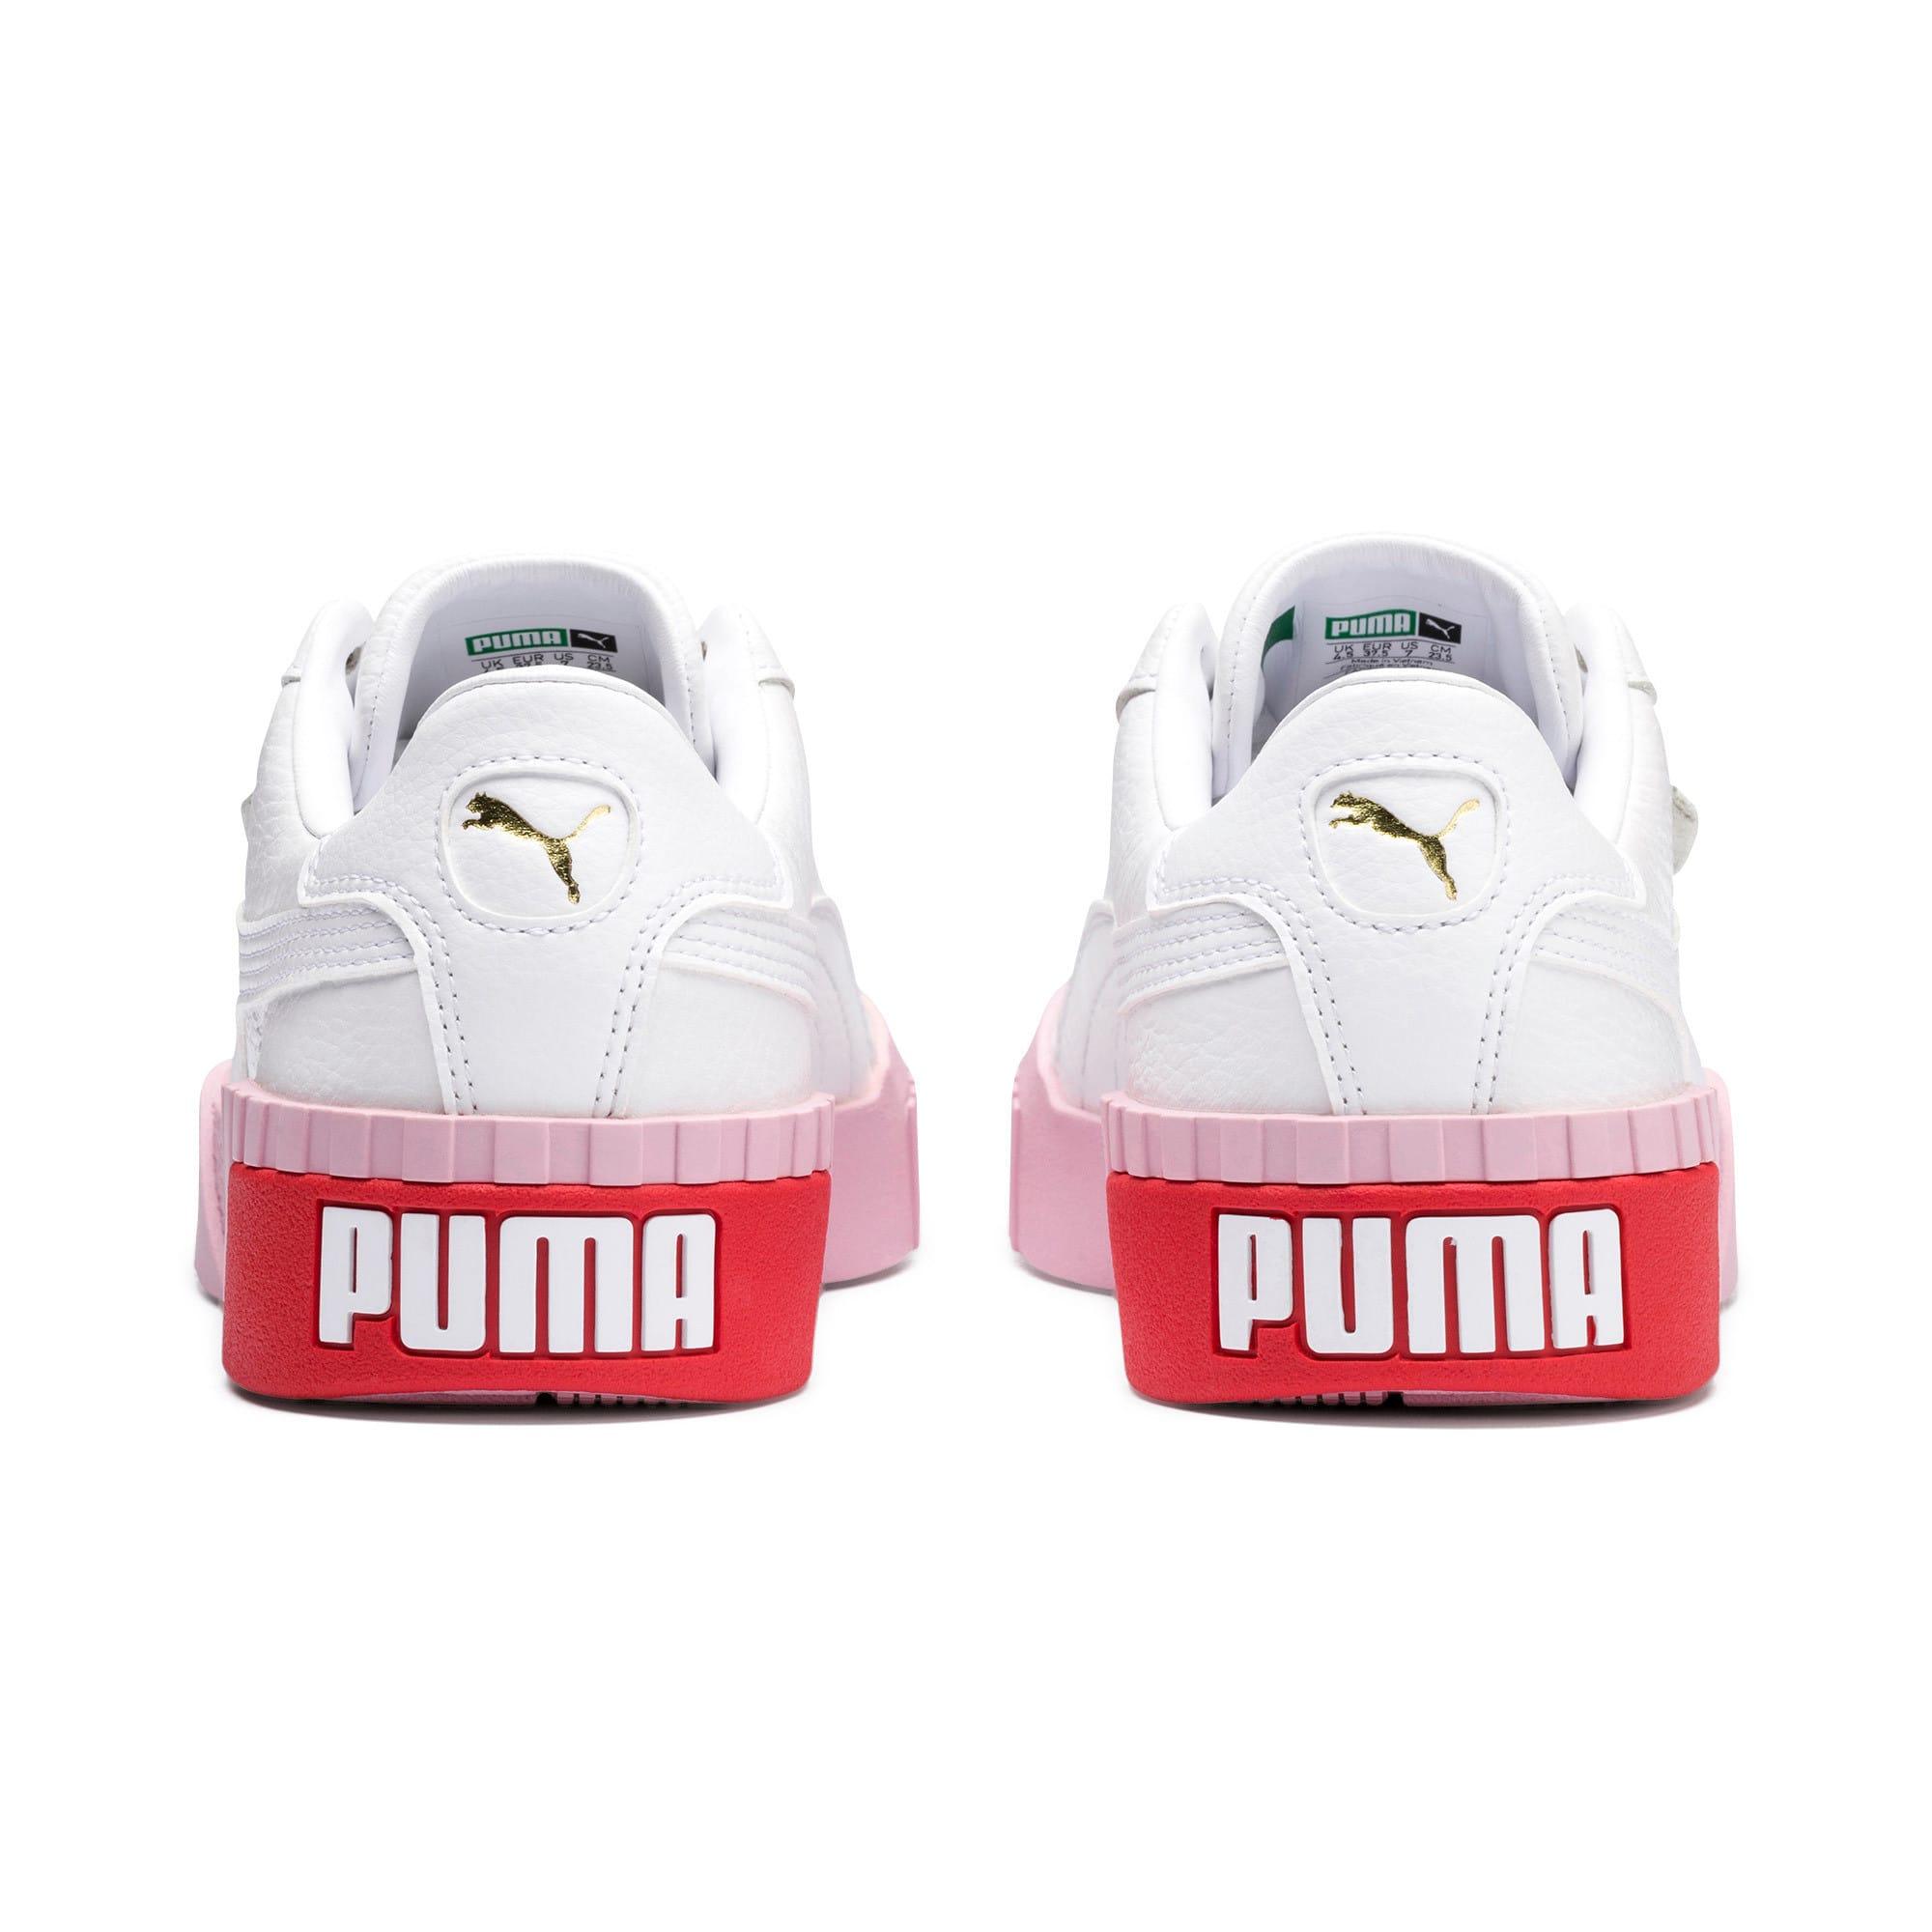 Thumbnail 4 of Basket Cali pour femme, Puma White-Pale Pink, medium